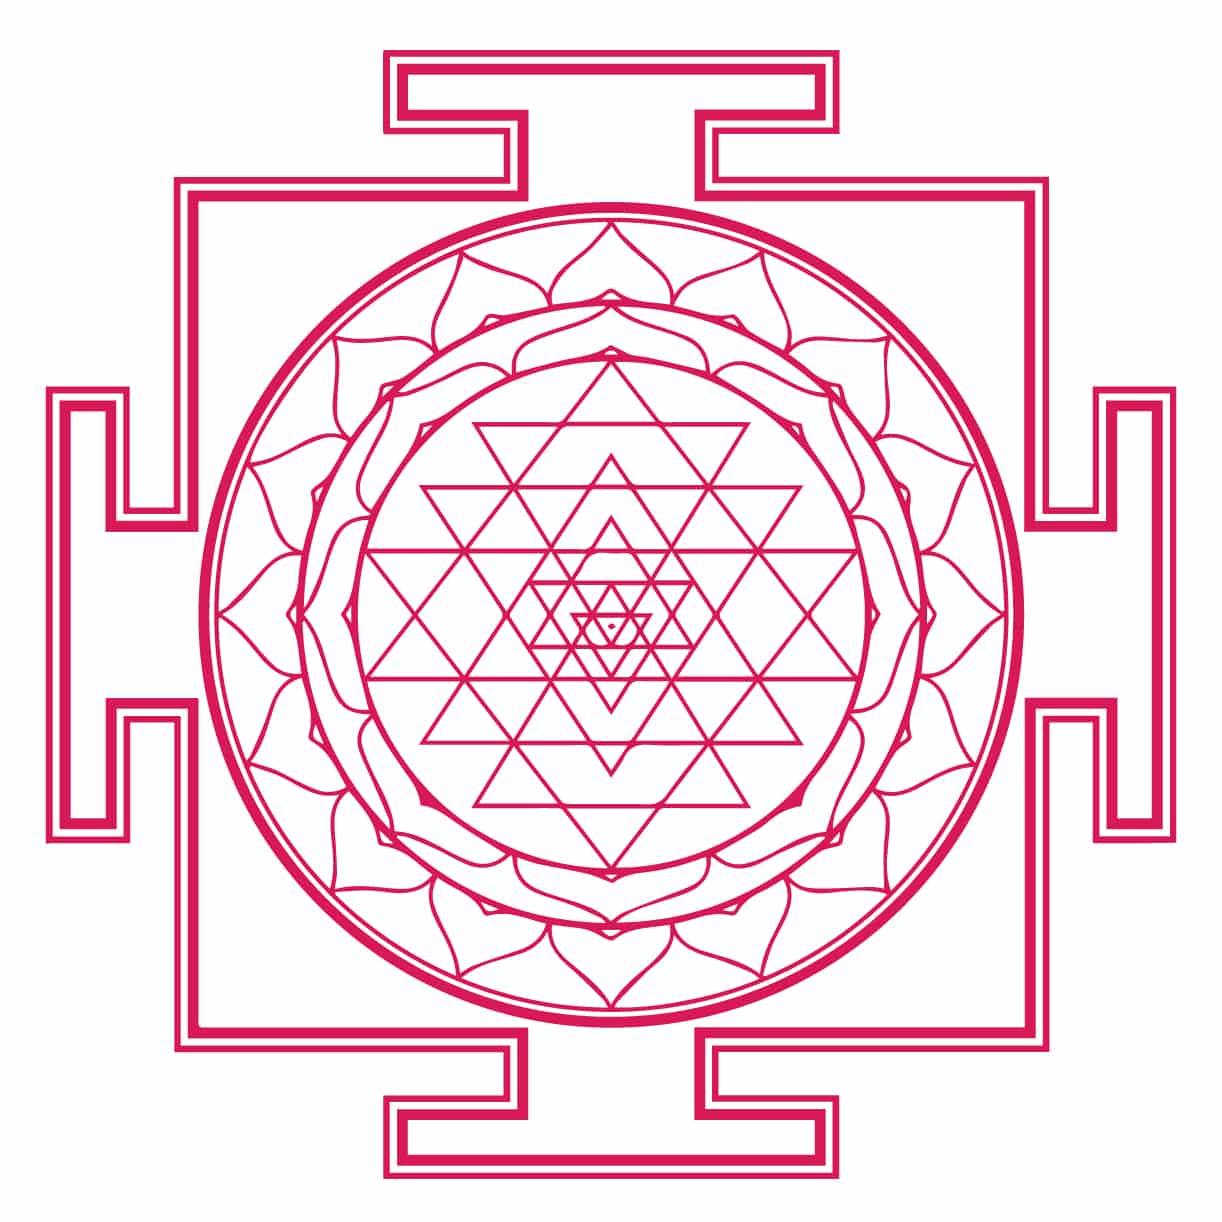 Sri Yantra Sri Chakra Shree Yantra Symbol And Its Meaning sri yantra sri chakra symbol (shree yantra) and its meaning